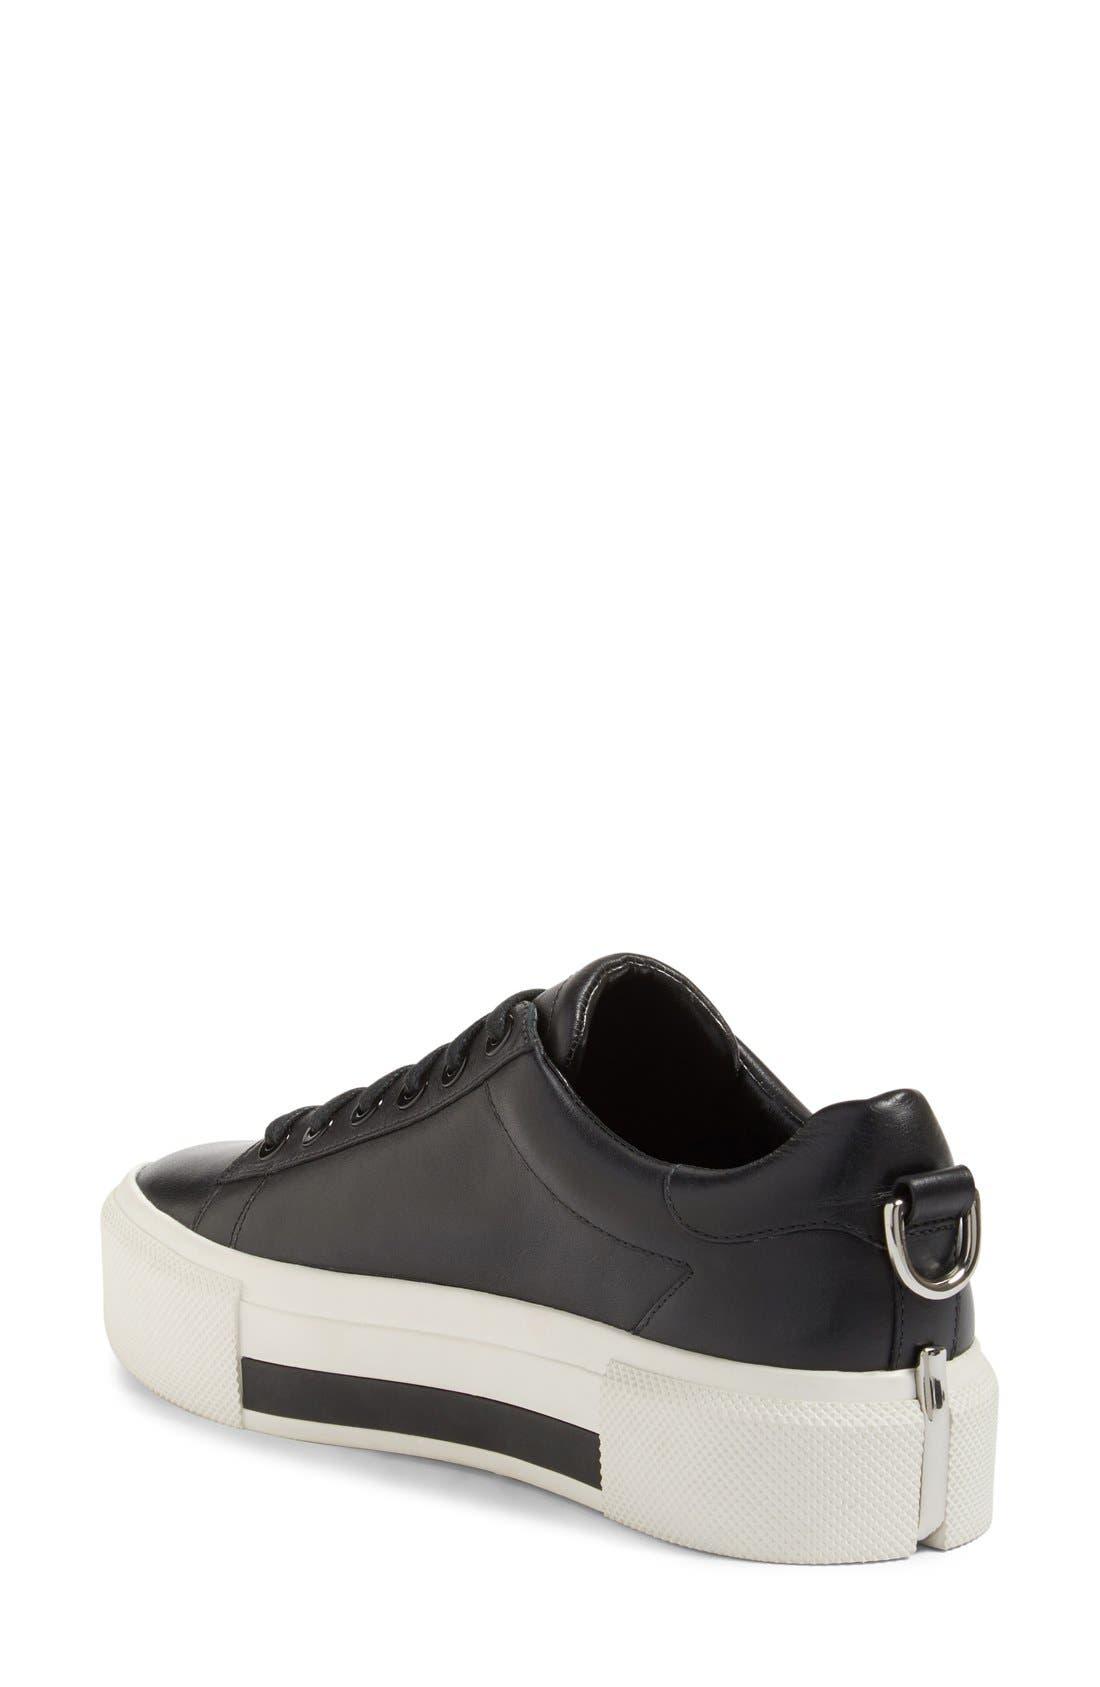 Alternate Image 2  - KENDALL + KYLIE Tyler Platform Sneaker (Women)